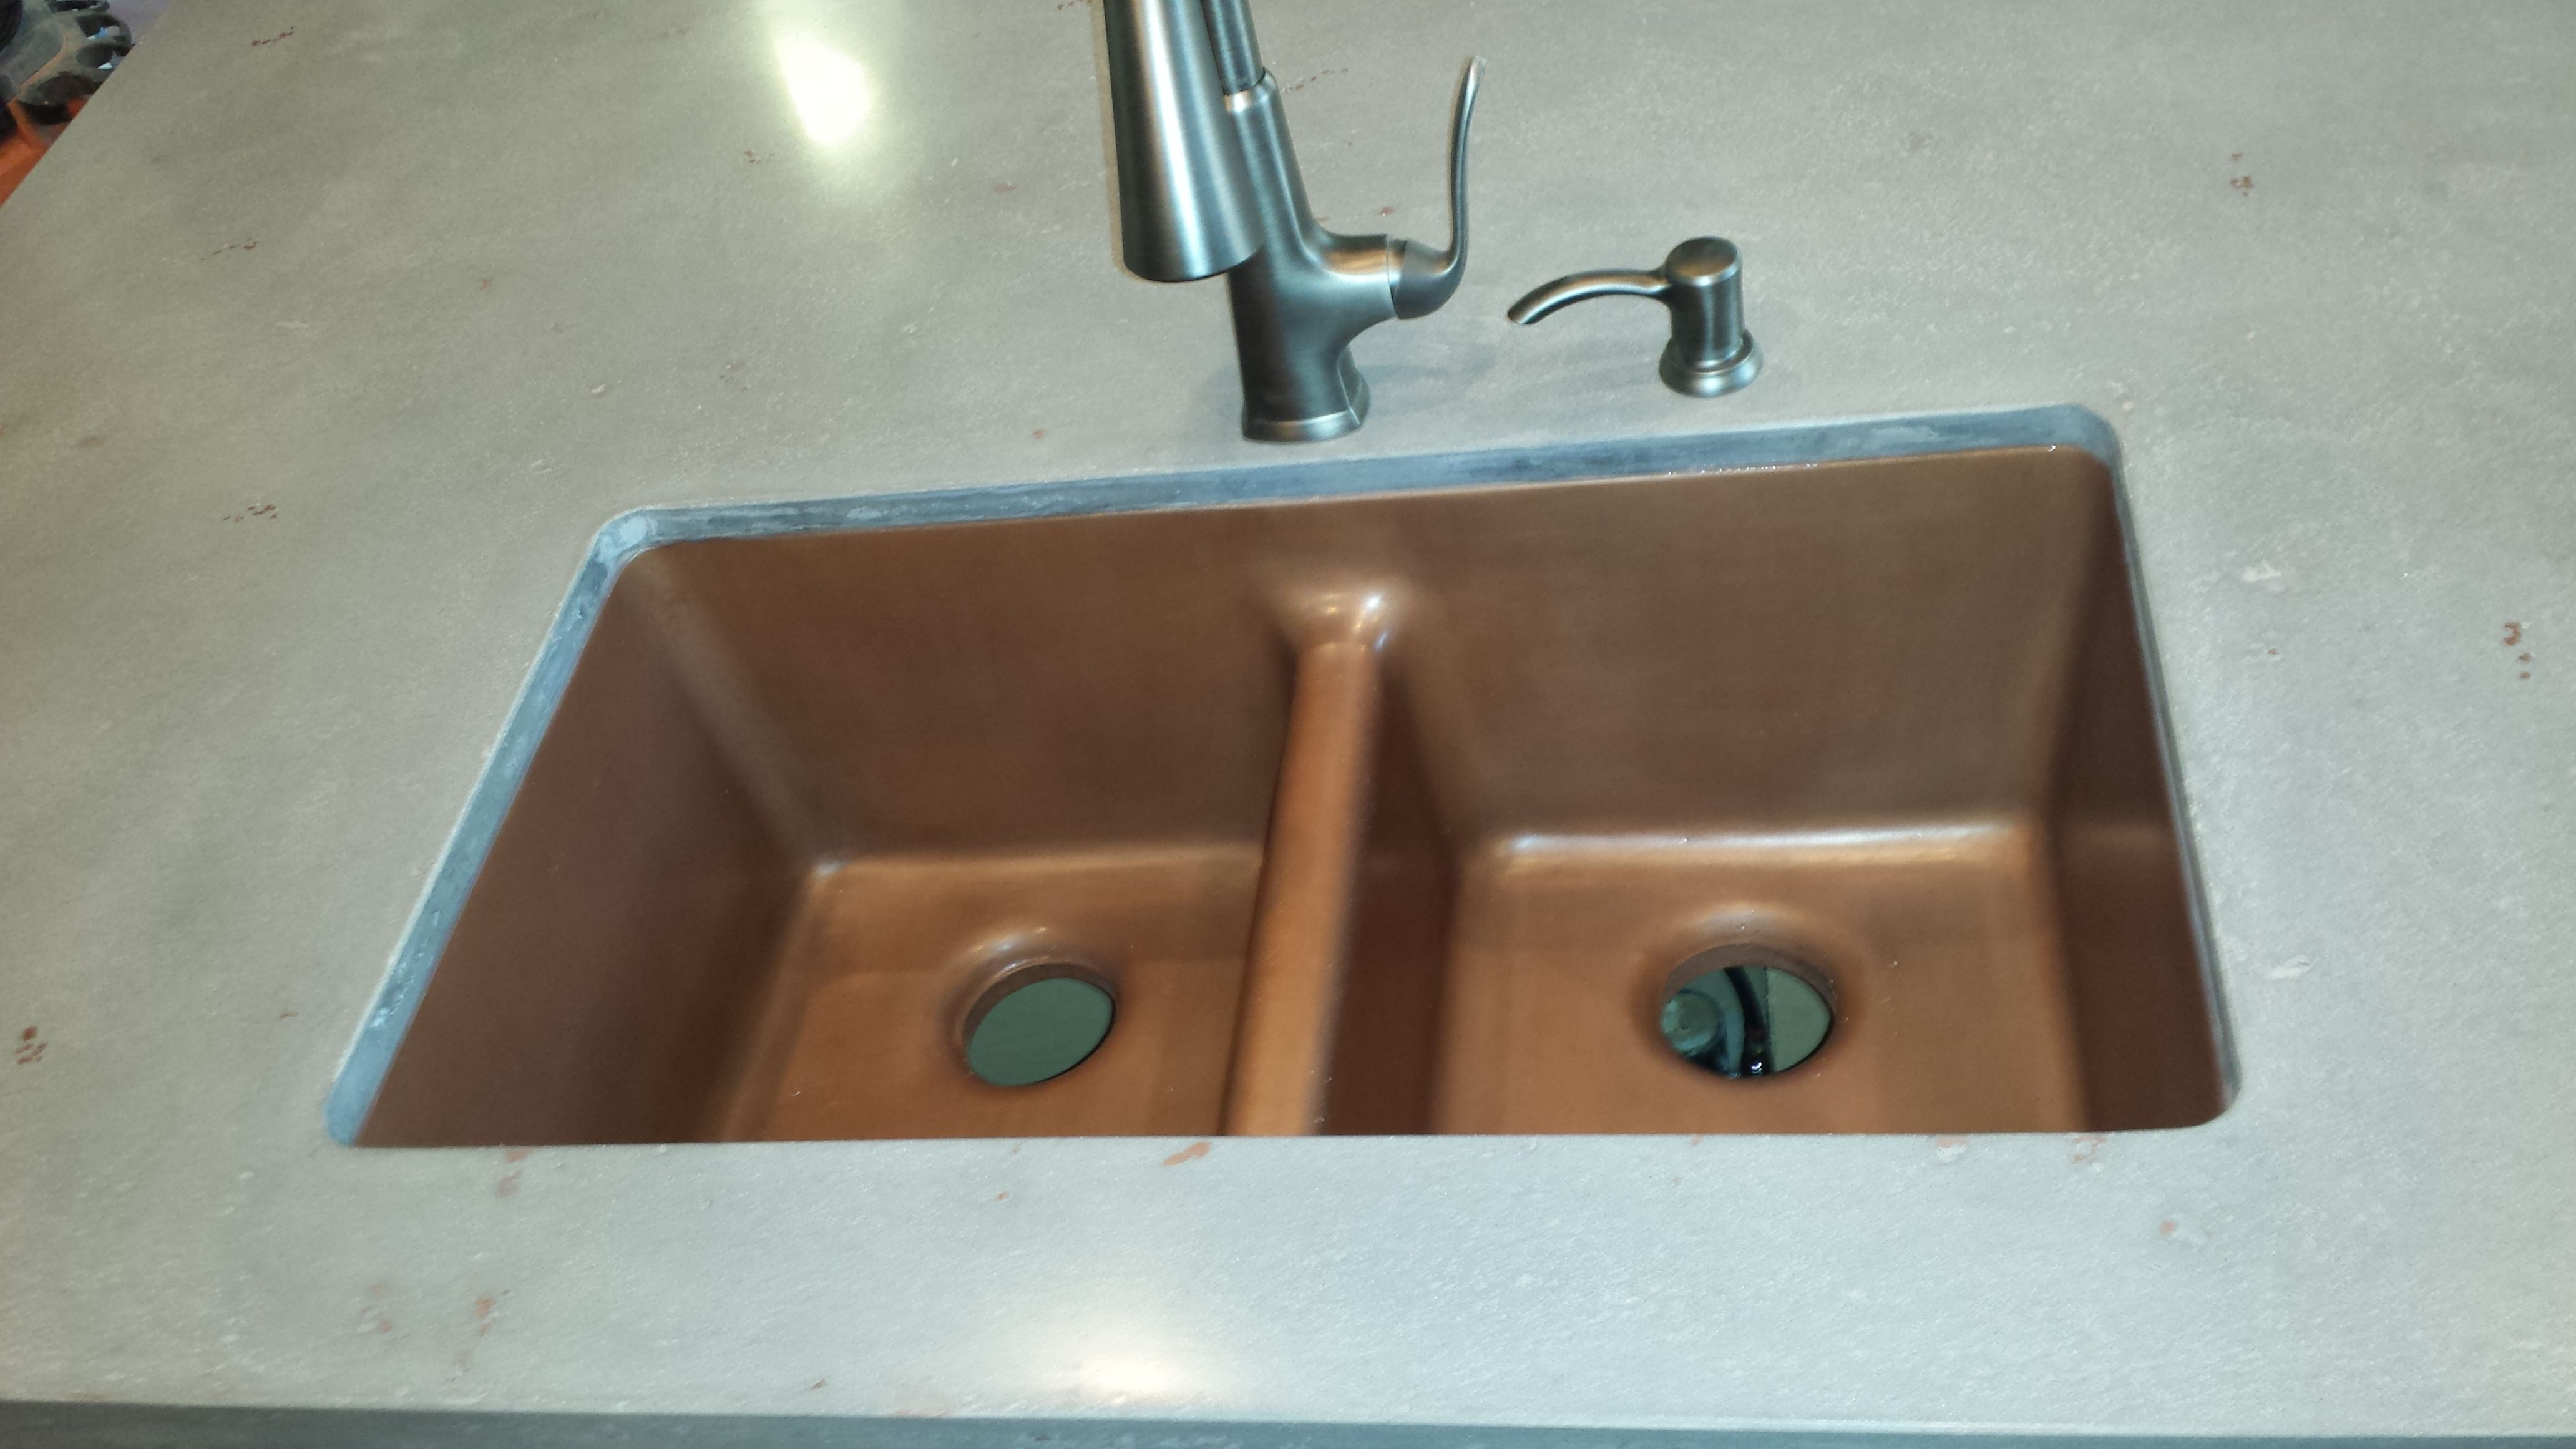 Buy a Handmade Sink Custom Concrete Gfrc Concrete Copper Sink 36